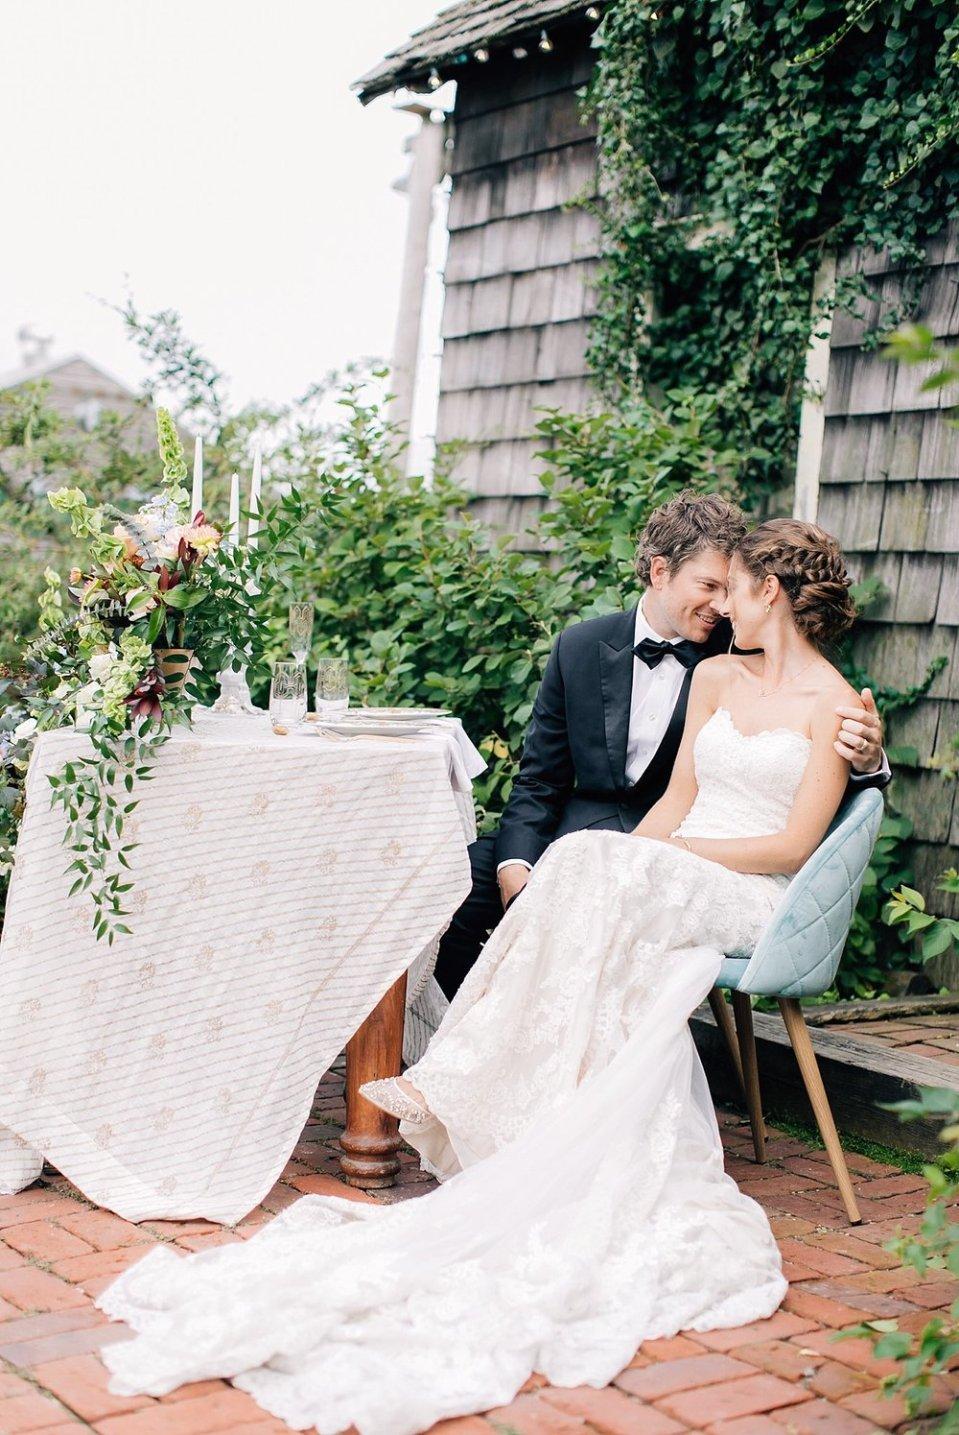 terrain gatherings glen mills pa romantic garden wedding photography magdalena studios 0013